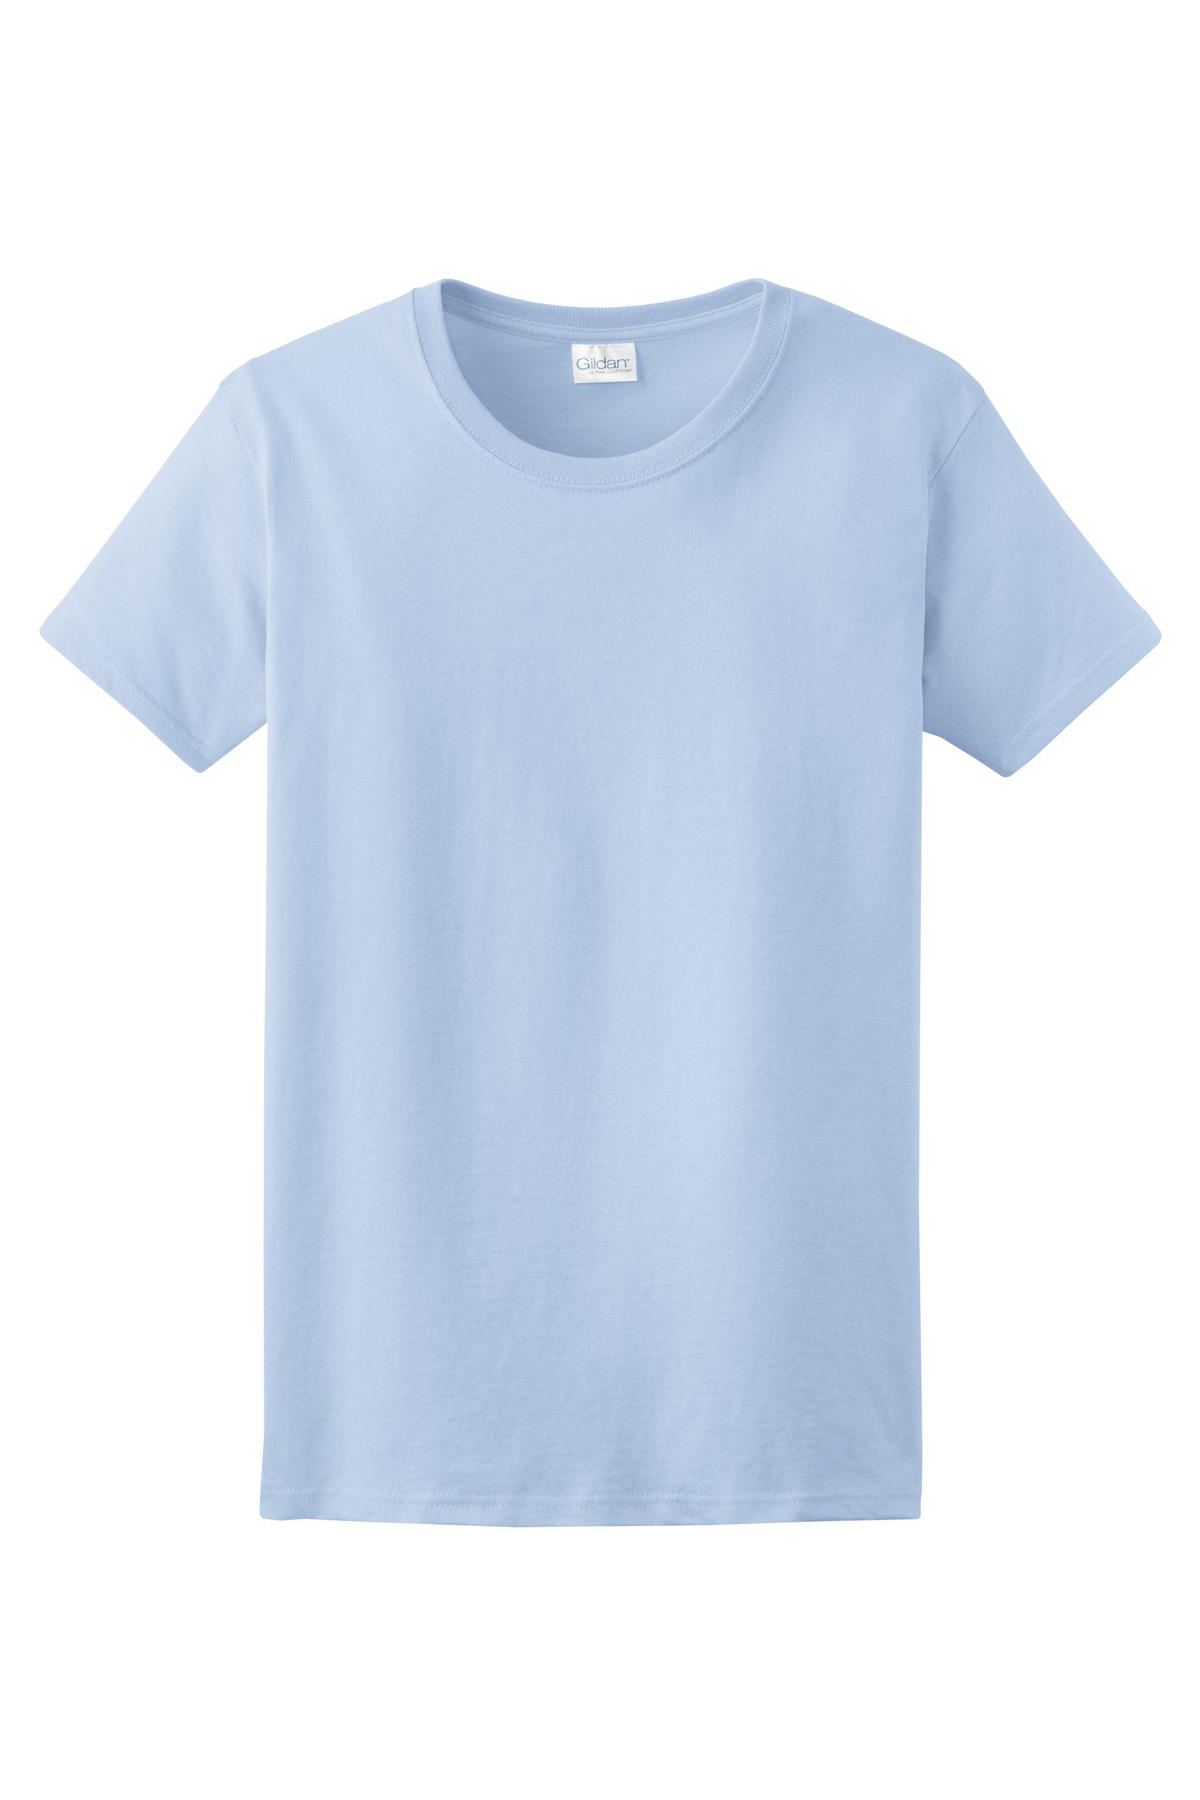 Gildan 174 Ladies Ultra Cotton 174 100 Cotton T Shirt 6 6 1